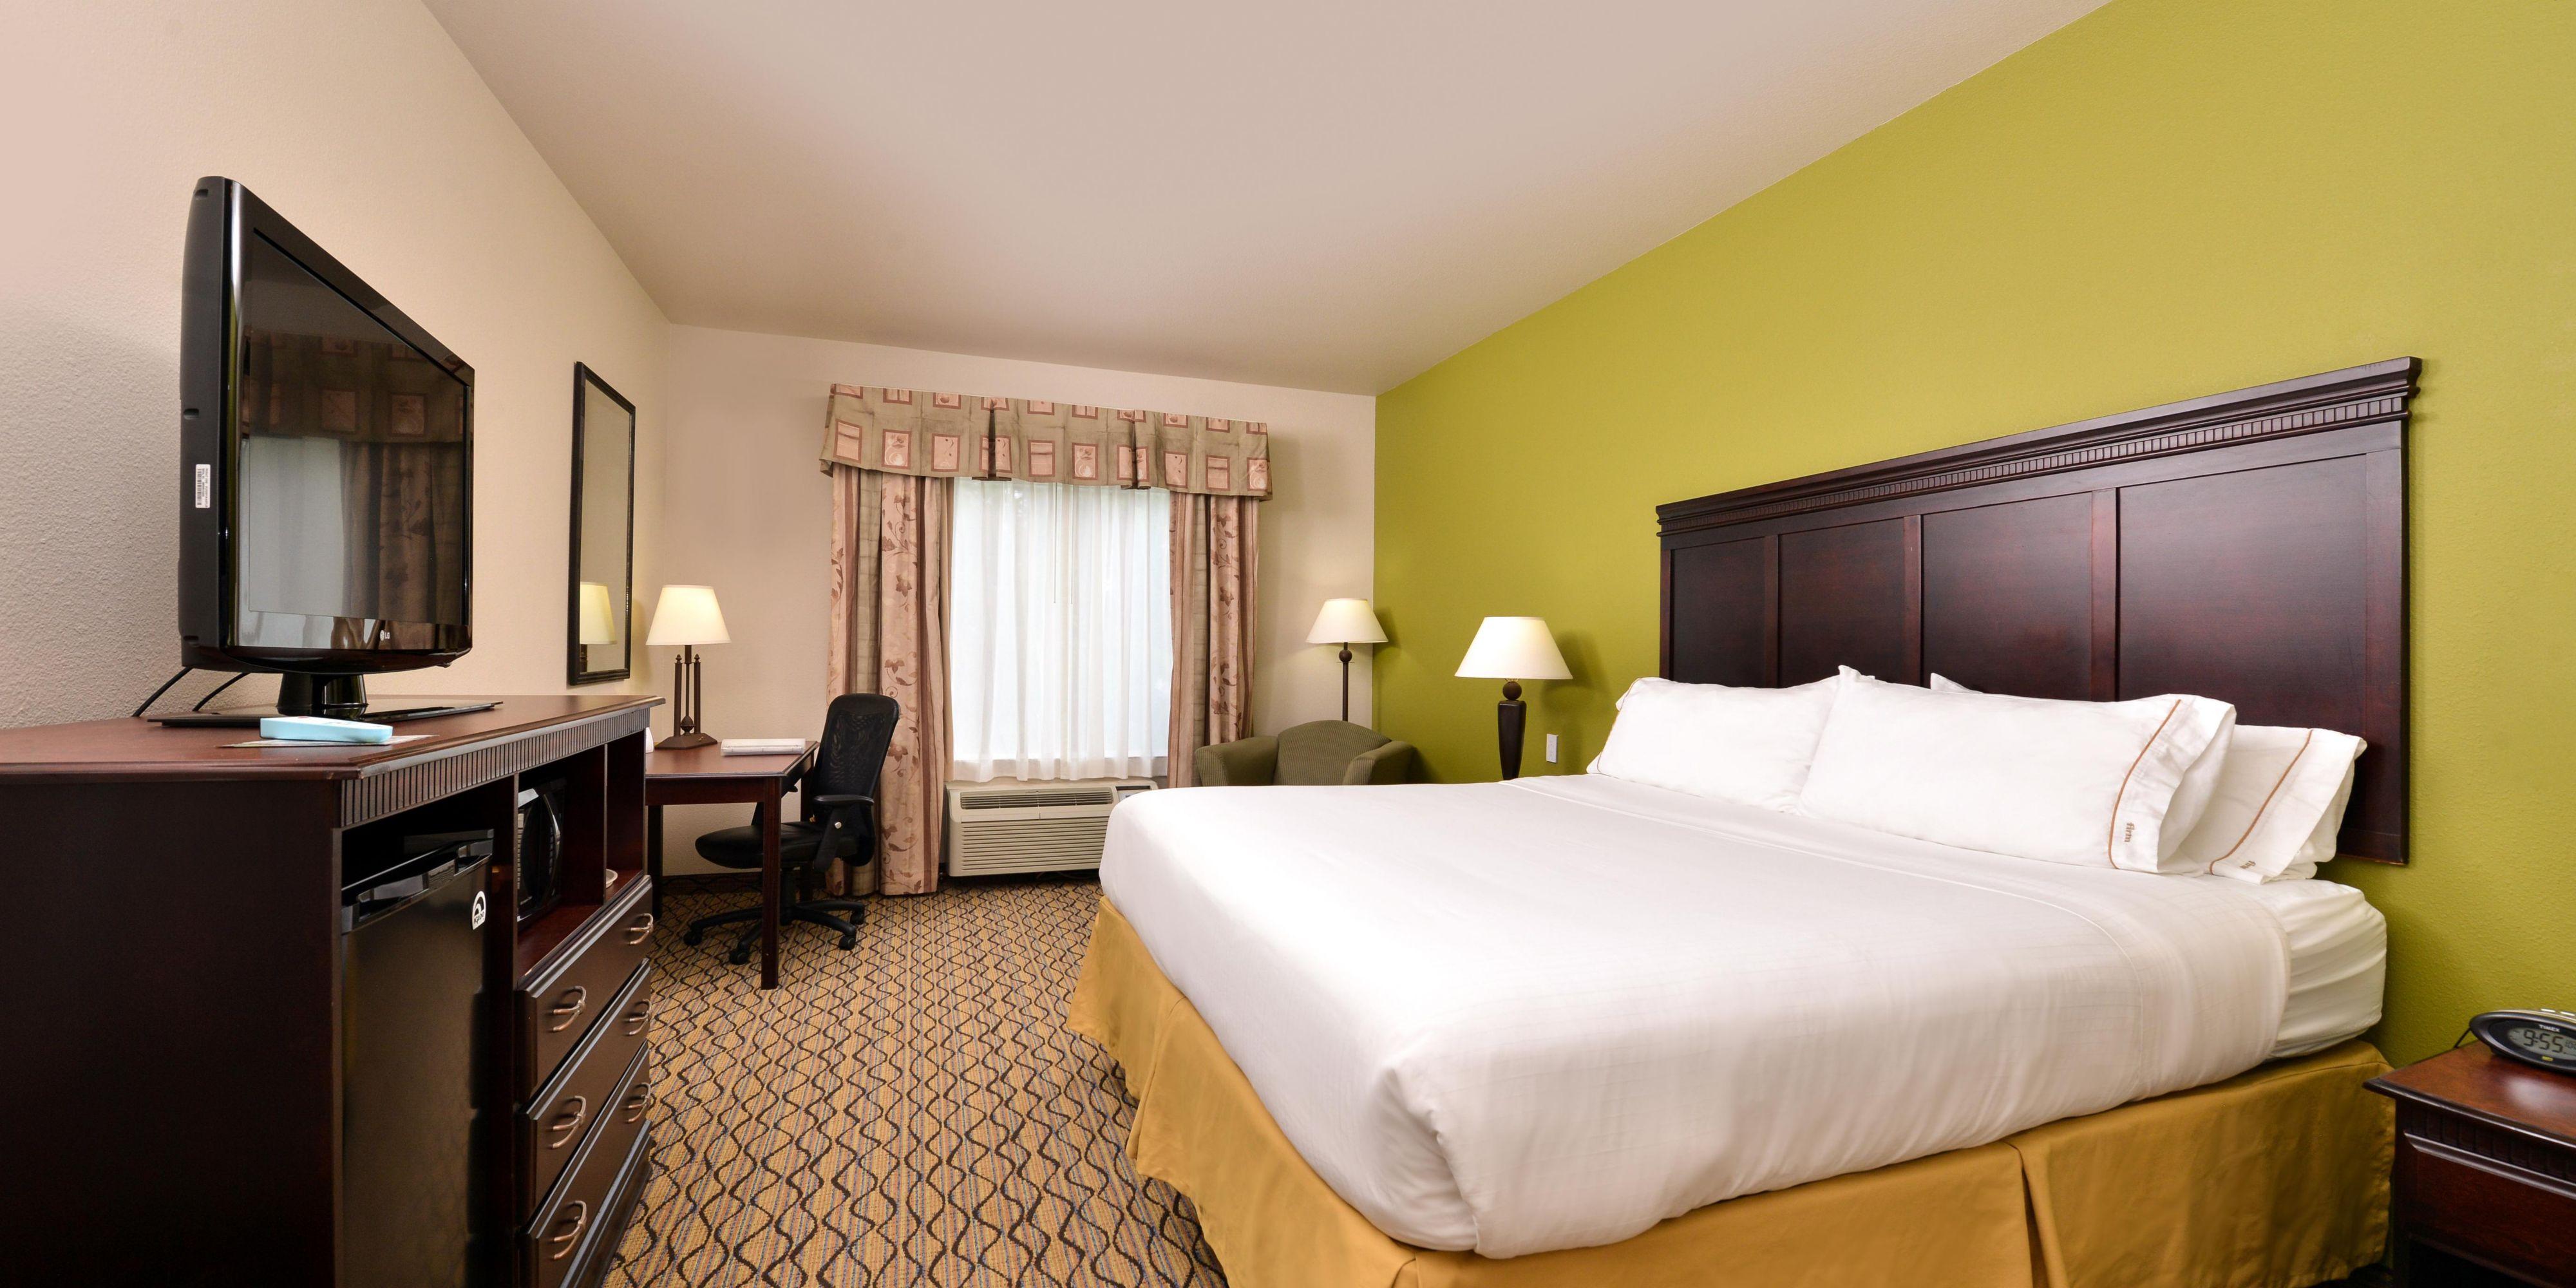 holiday inn express suites sherman hwy 75 hotel ihg